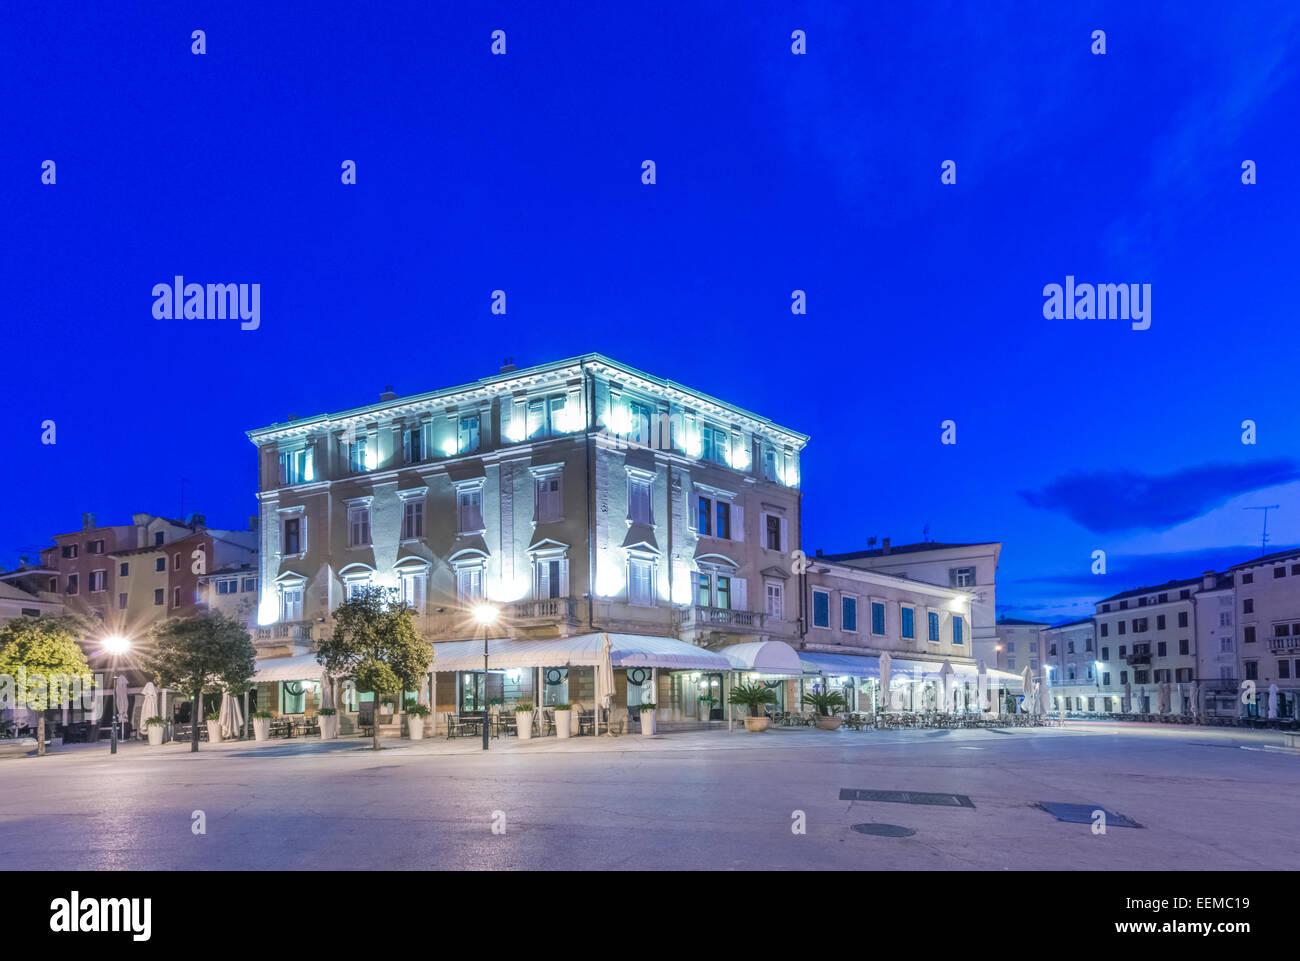 Illuminated town square and buildings at night, Rovinj, Istria, Croatia - Stock Image